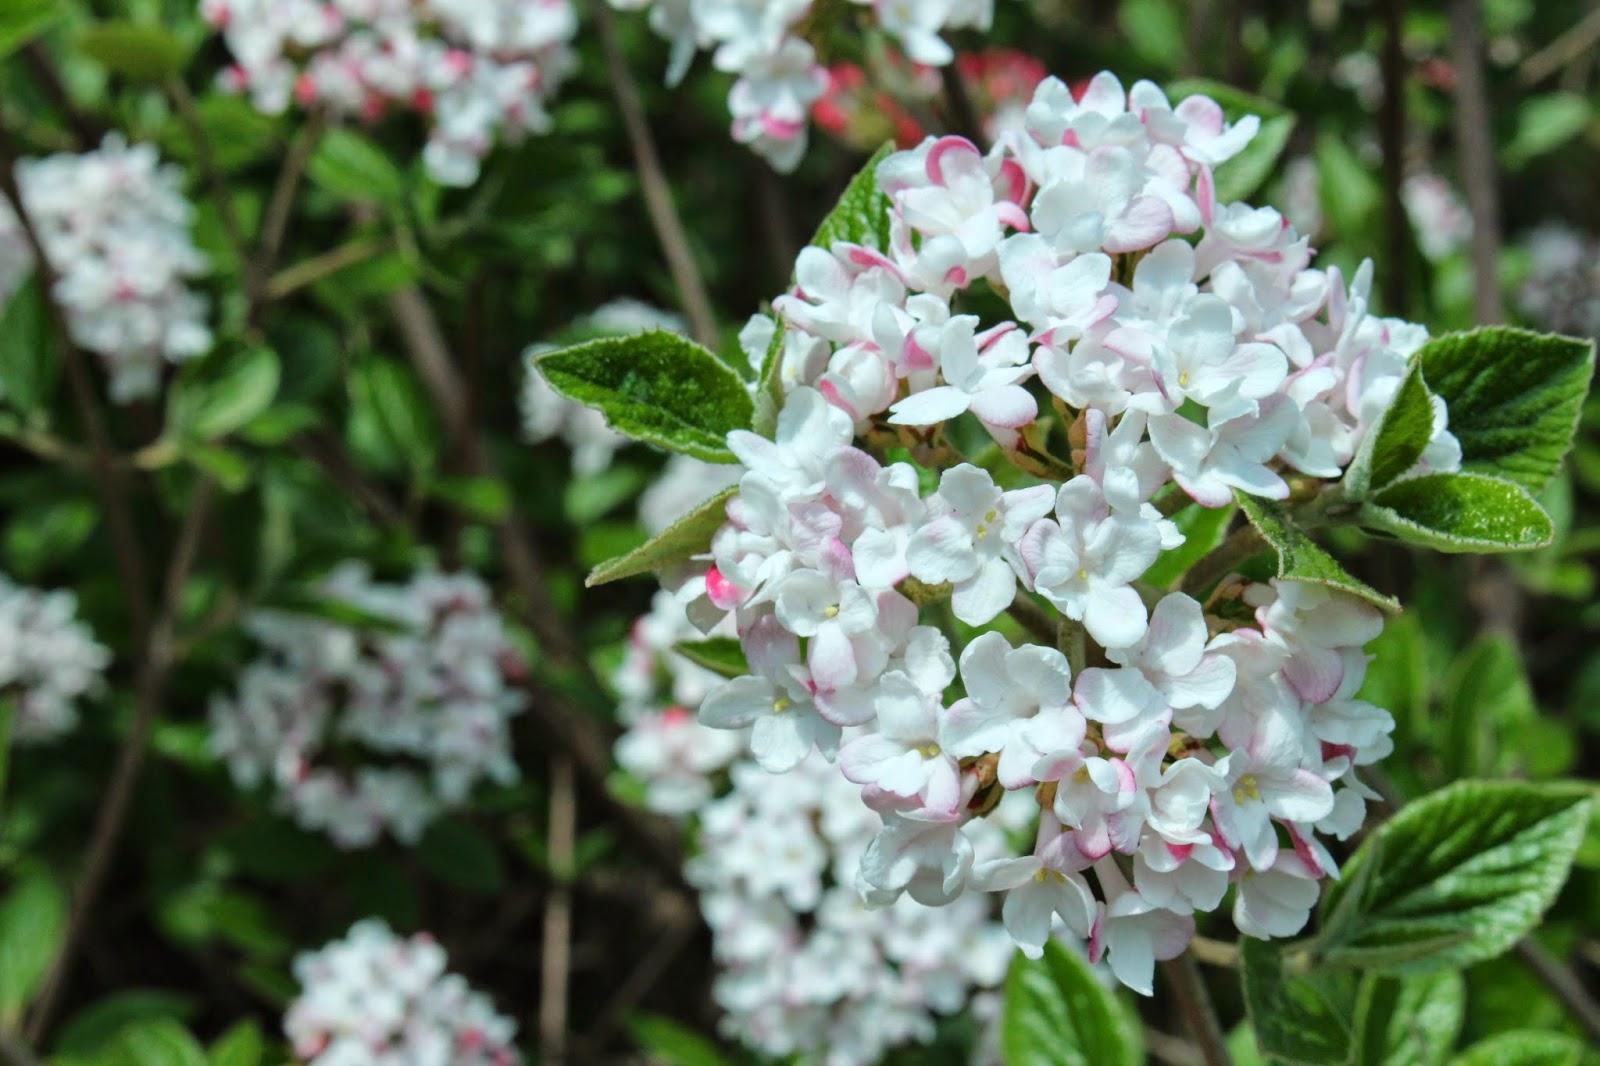 Springtime at Greenfield Village